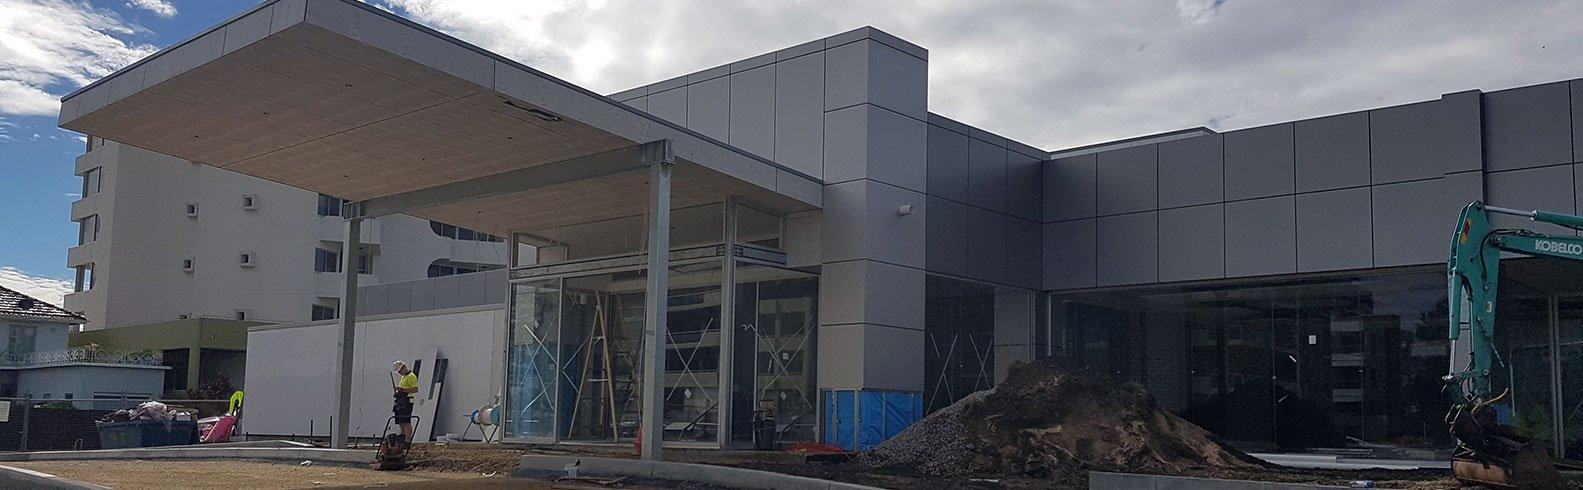 Eastport Bowling Club Port macquarie -  Commercial Cladding